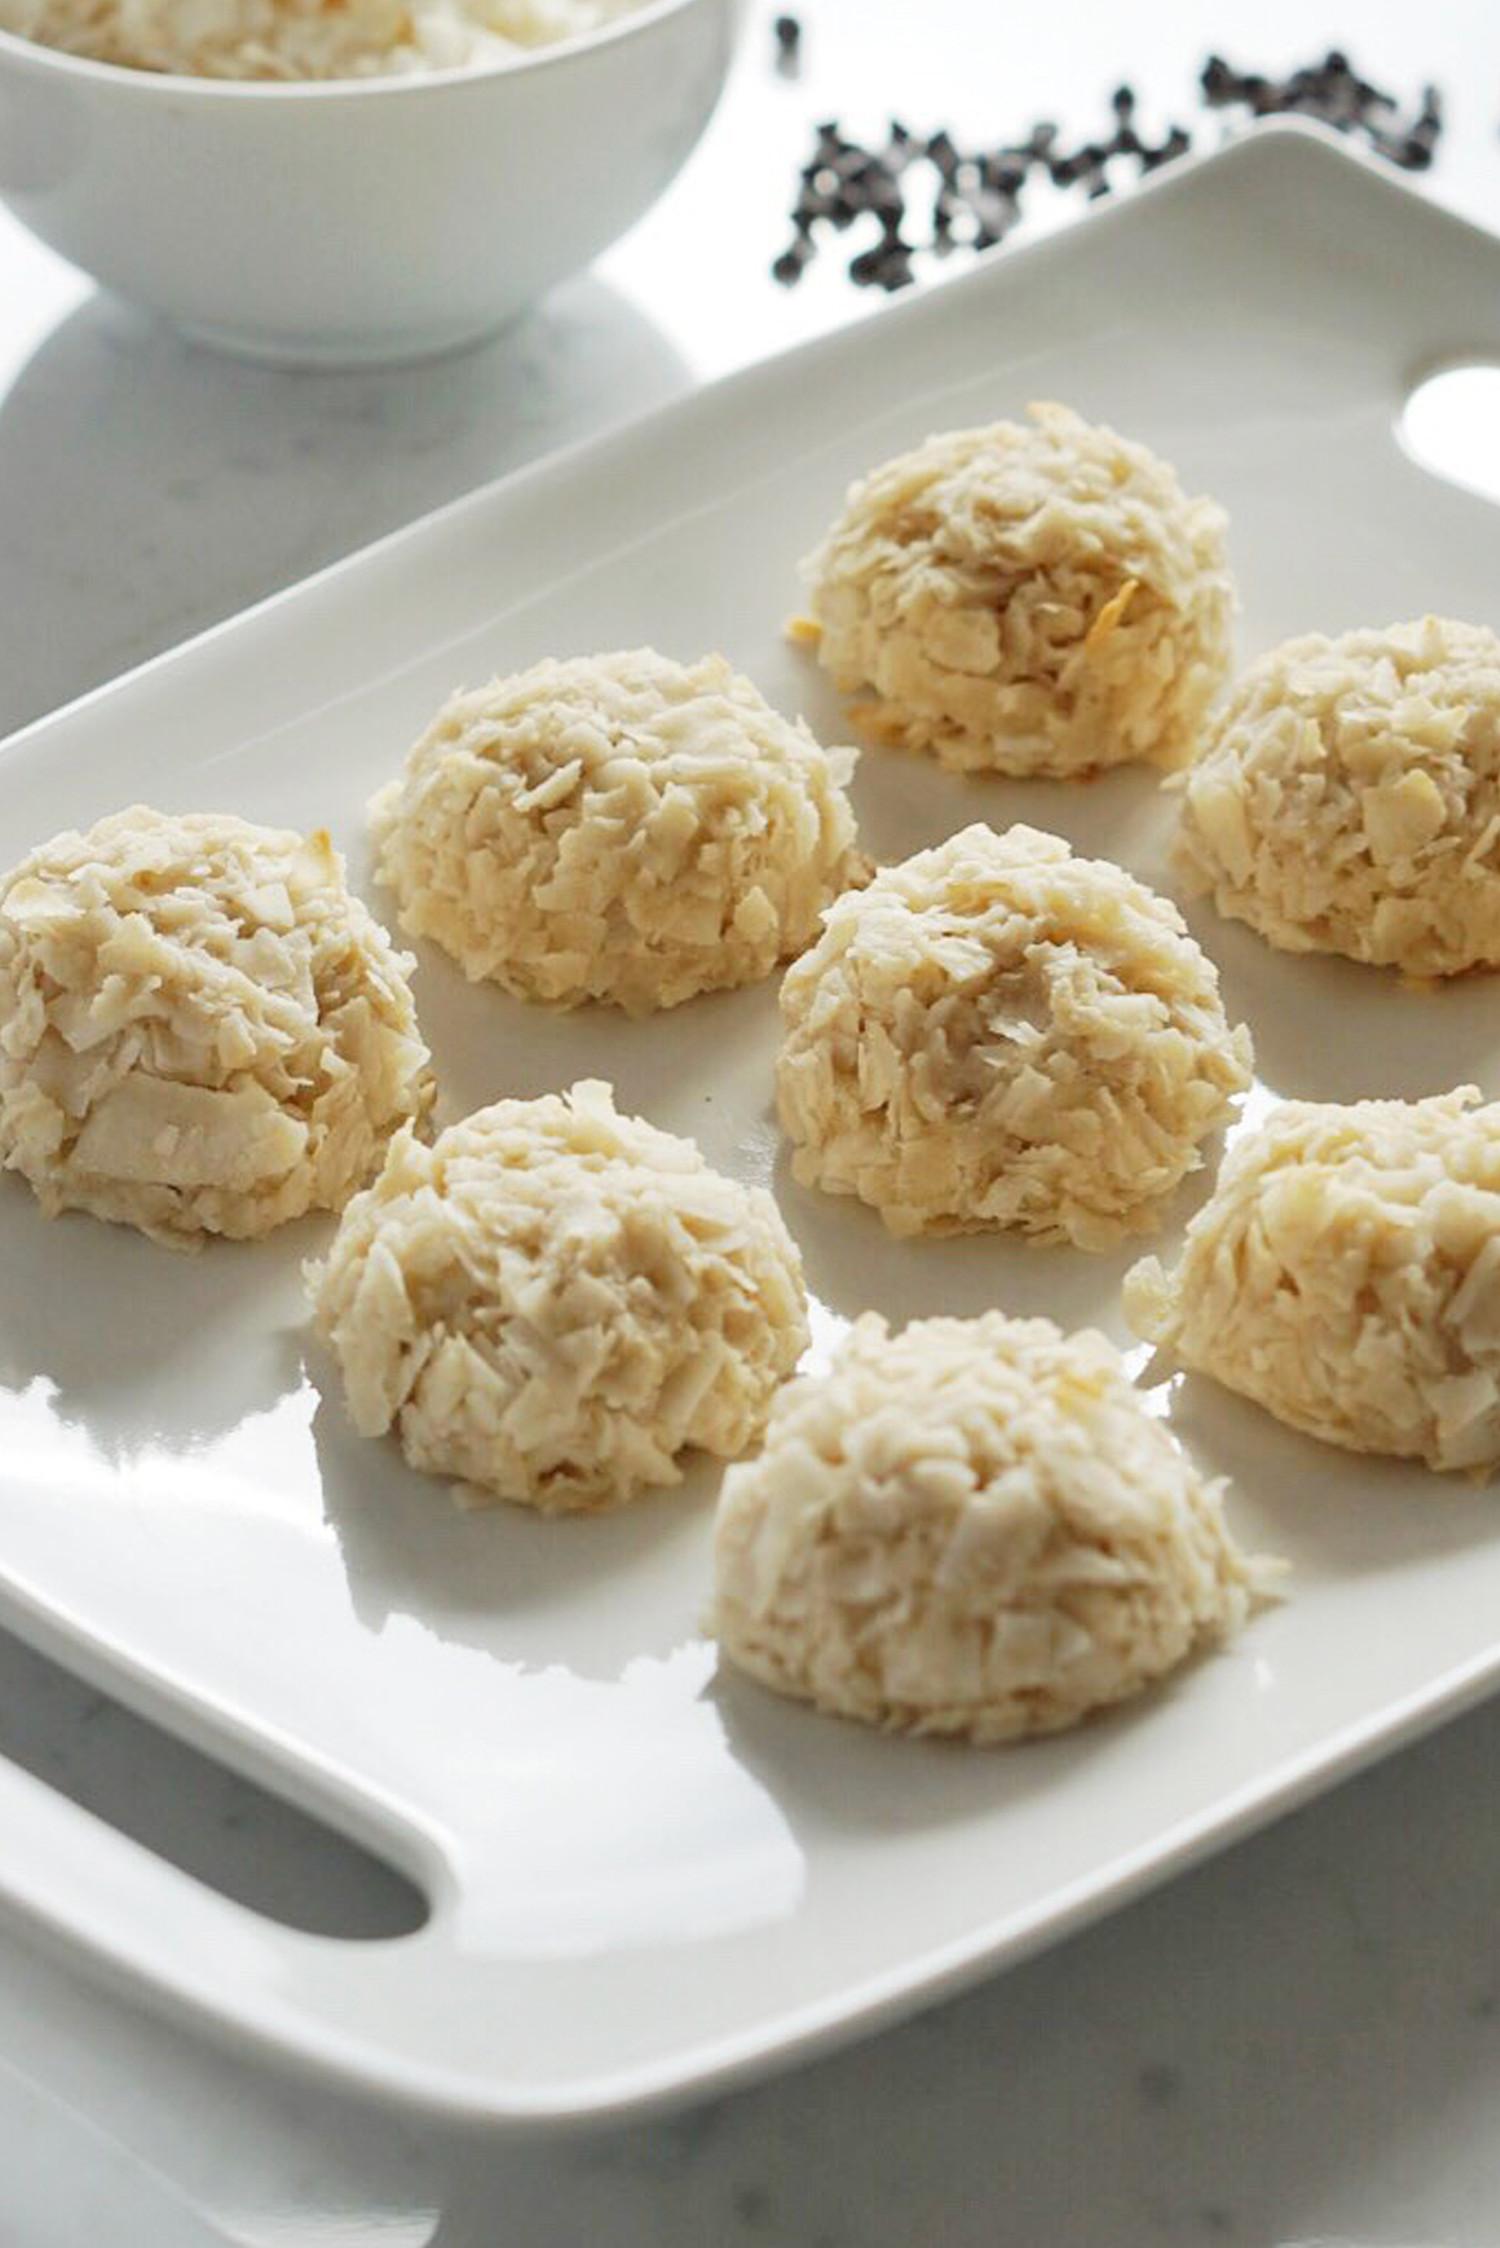 Healthy Coconut Macaroons Recipe  This Healthy Gluten Free Coconut Macaroons Recipe Is ly